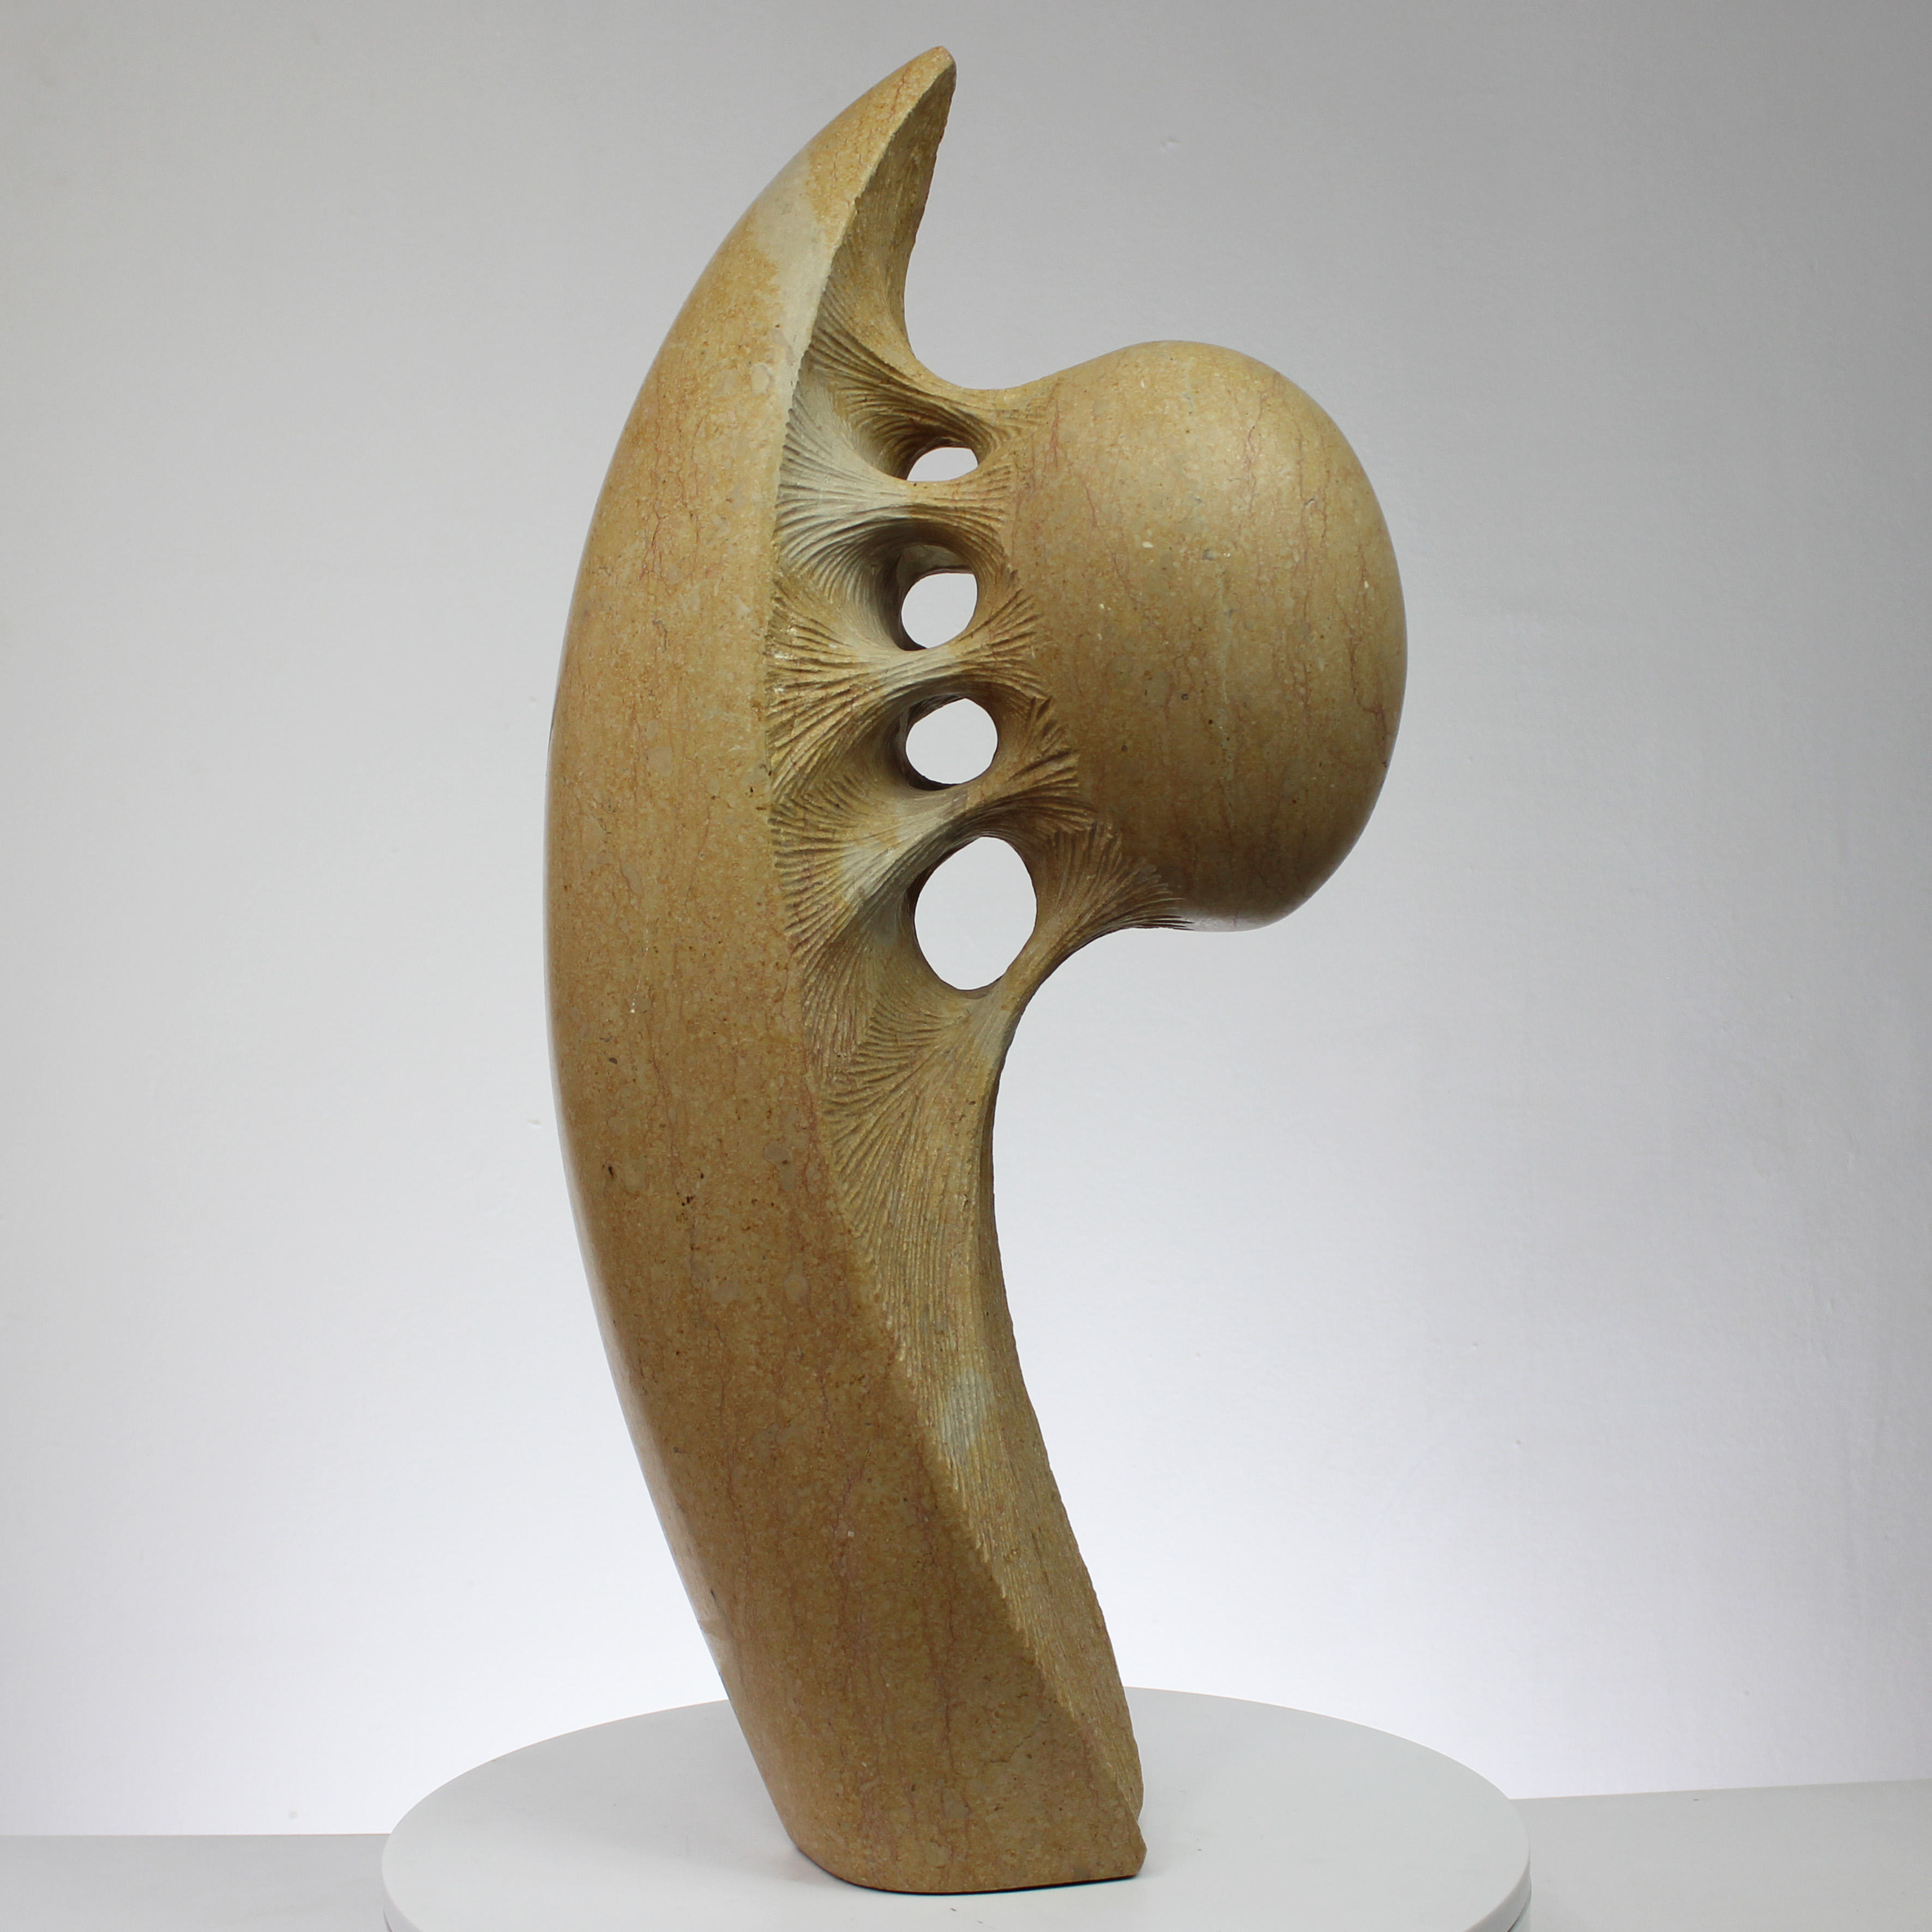 Gilbert Frizon - Sculpture pierre - Exposition Galerie Art Pluri